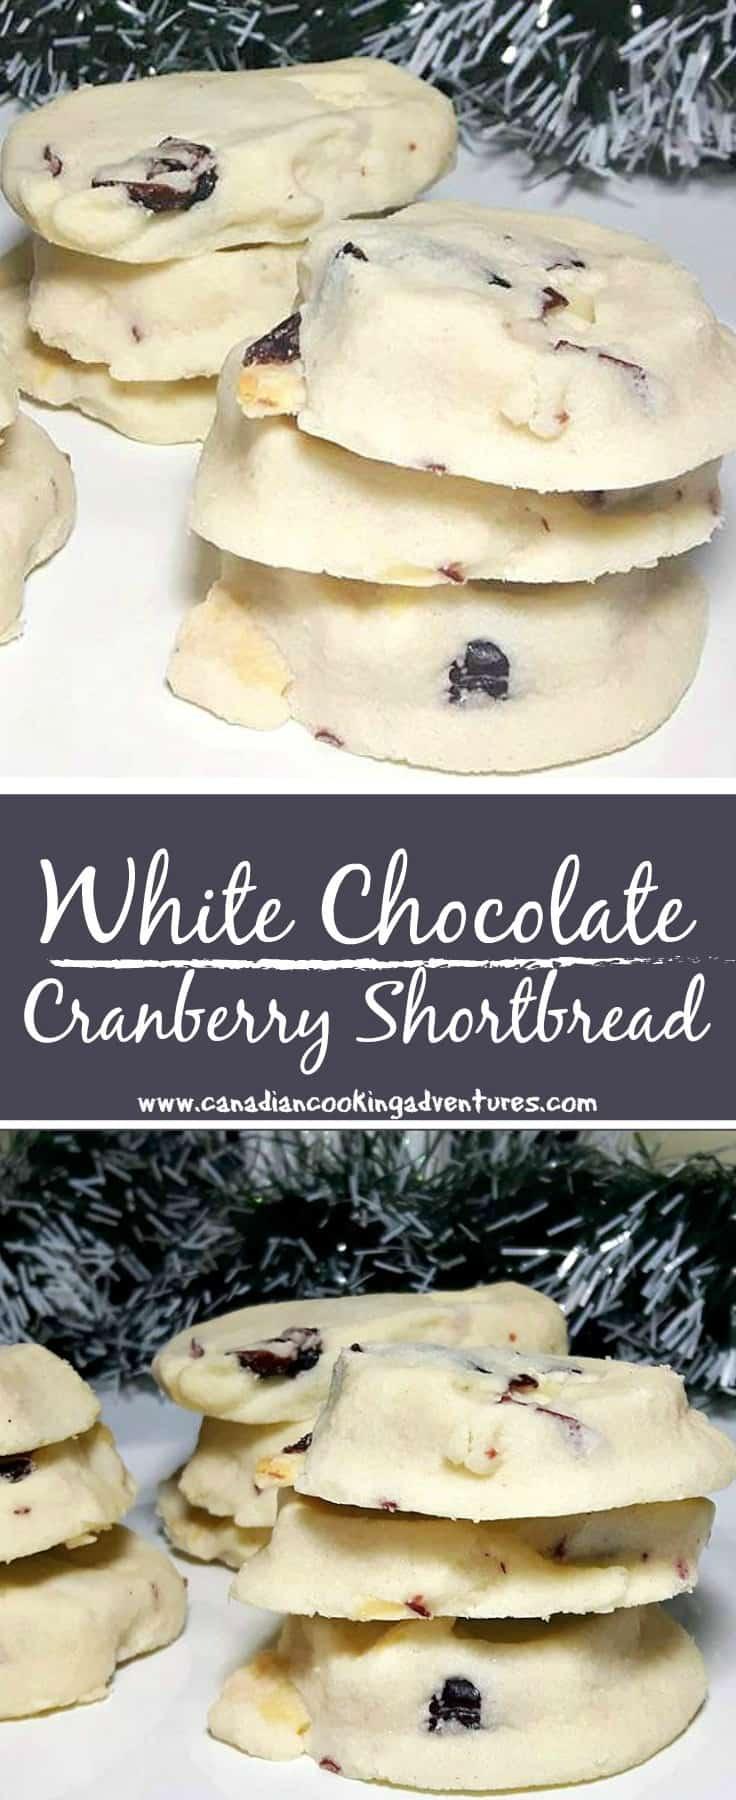 White Chocolate Cranberry Shortbread